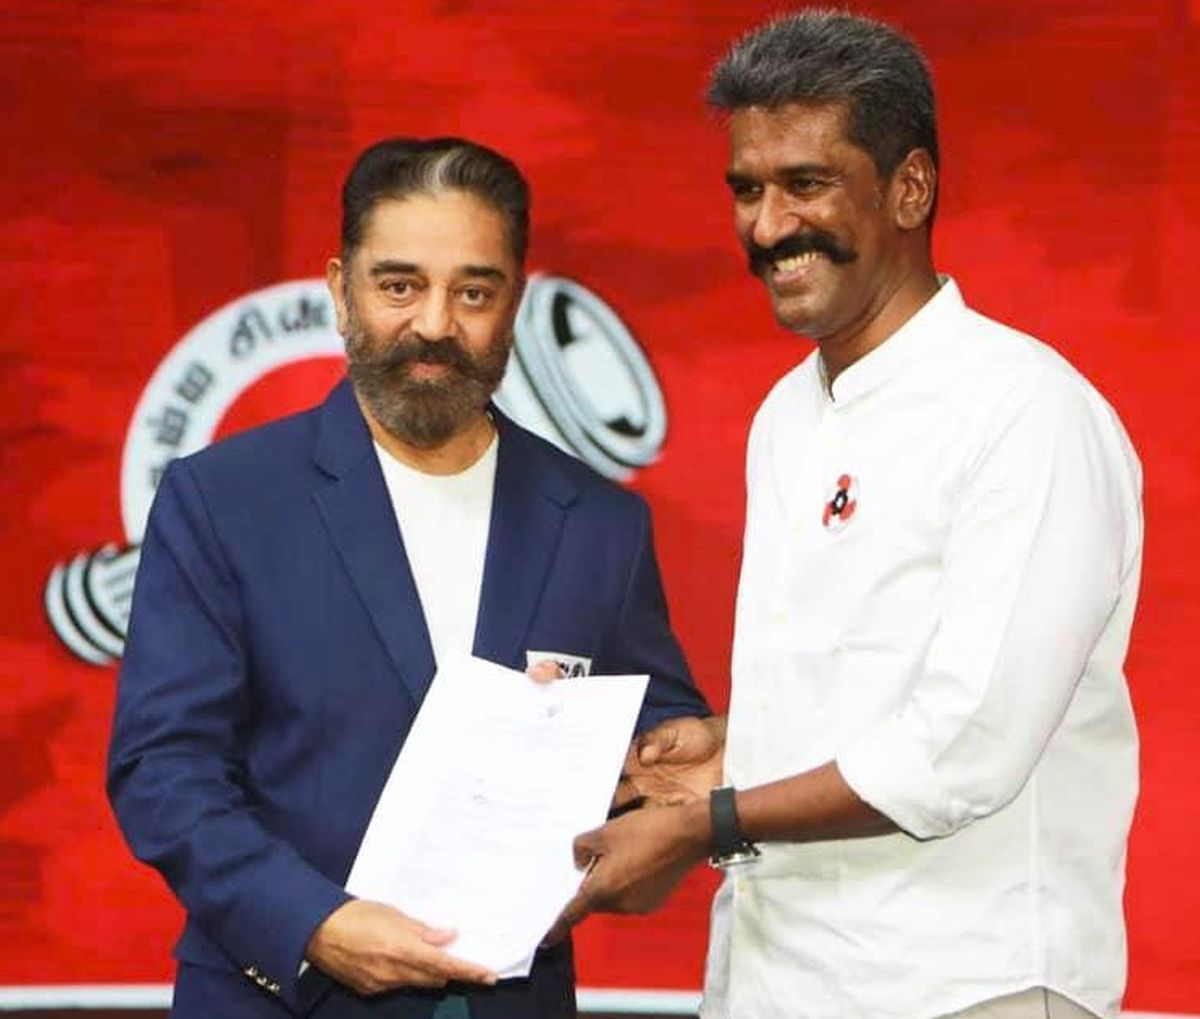 Betrayer, says Kamal Haasan as party VP quits - Rediff.com India News